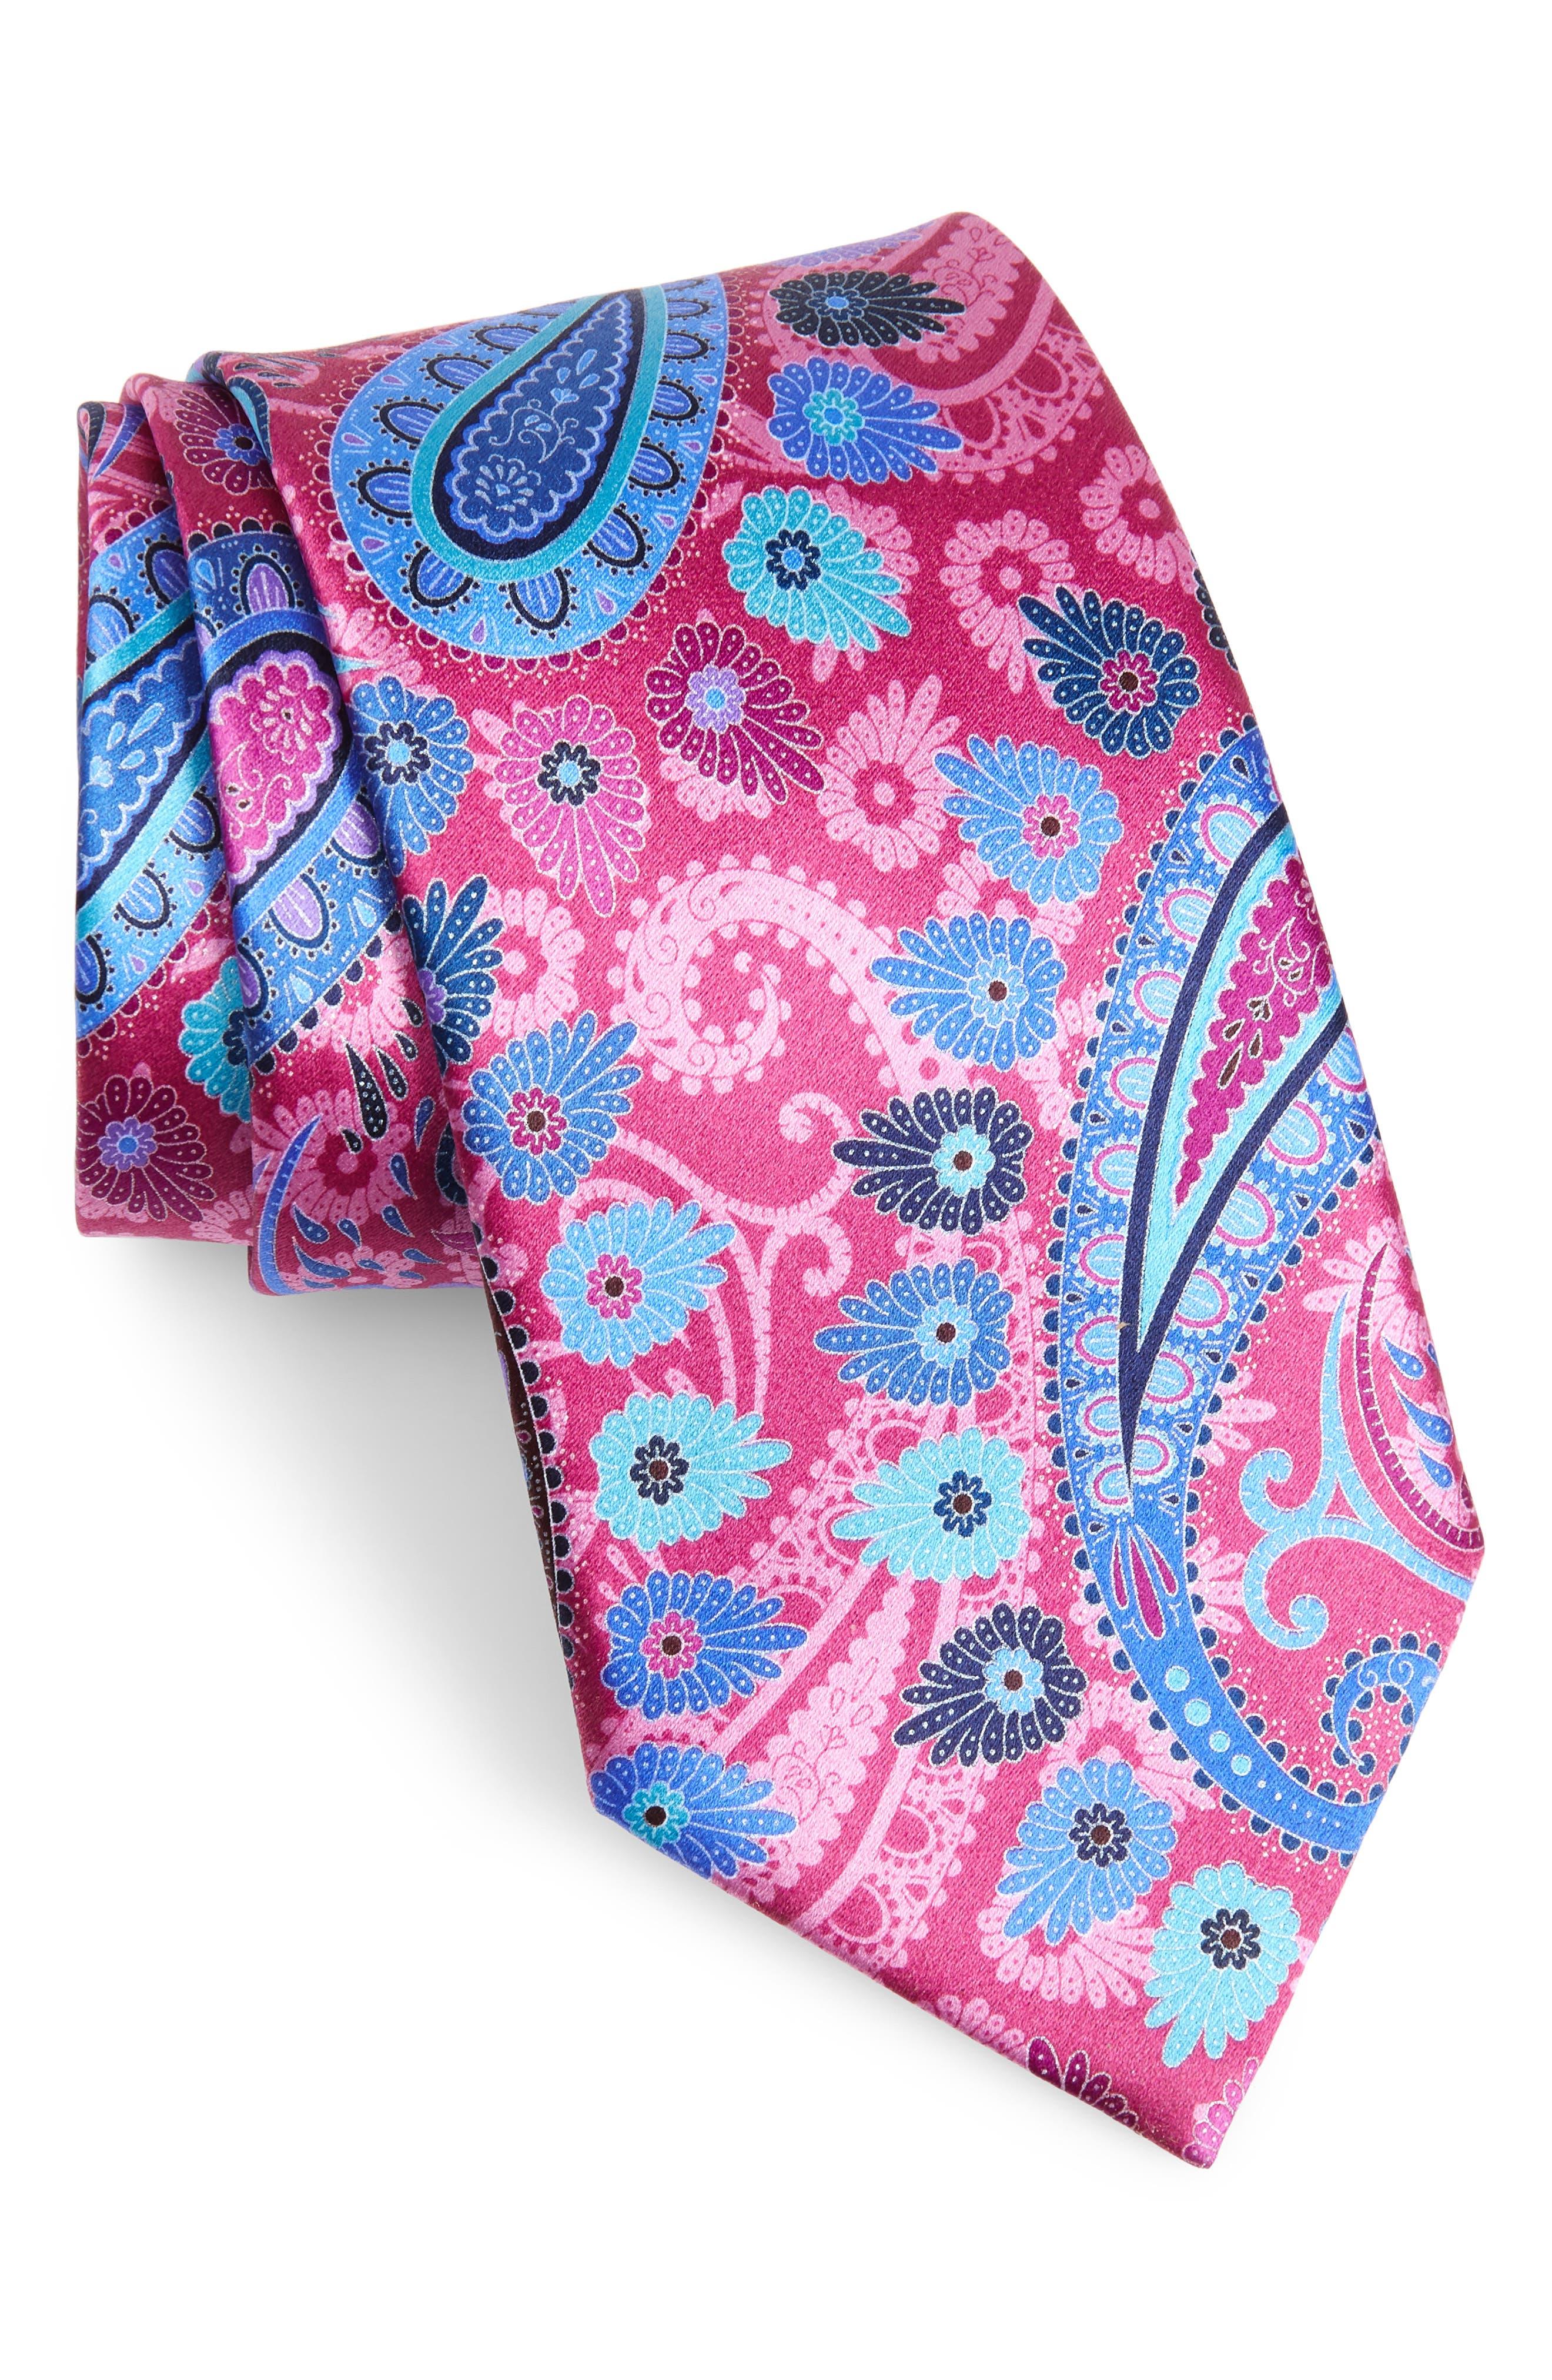 ERMENEGILDO ZEGNA Quindici Paisley Silk Tie, Main, color, PINK